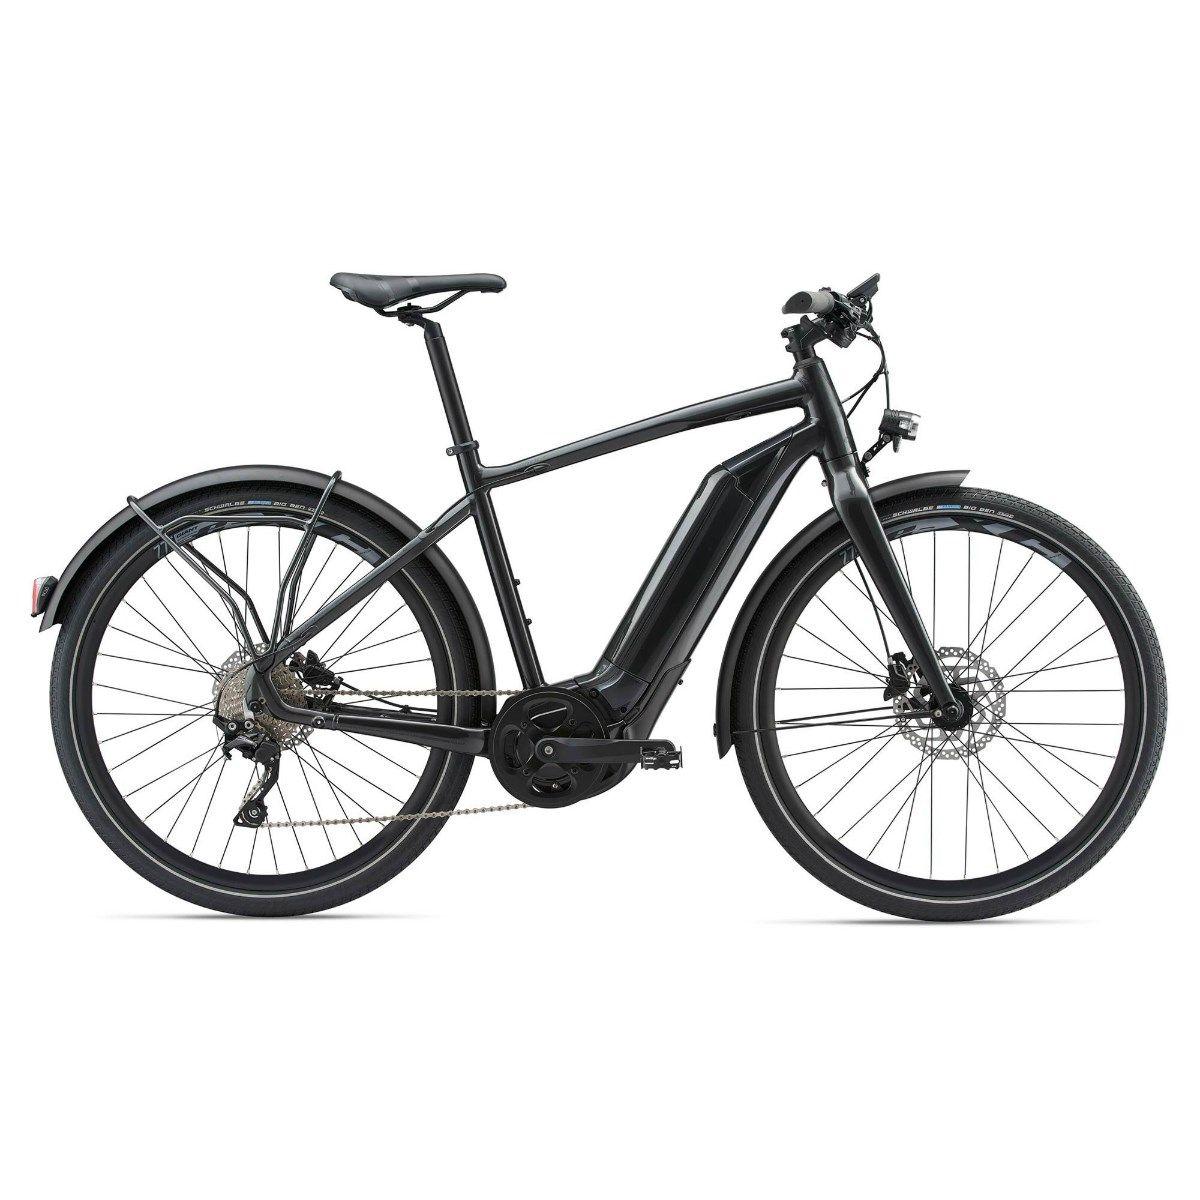 Giant QuickE Plus 2018 Electric Hybrid Bike Black